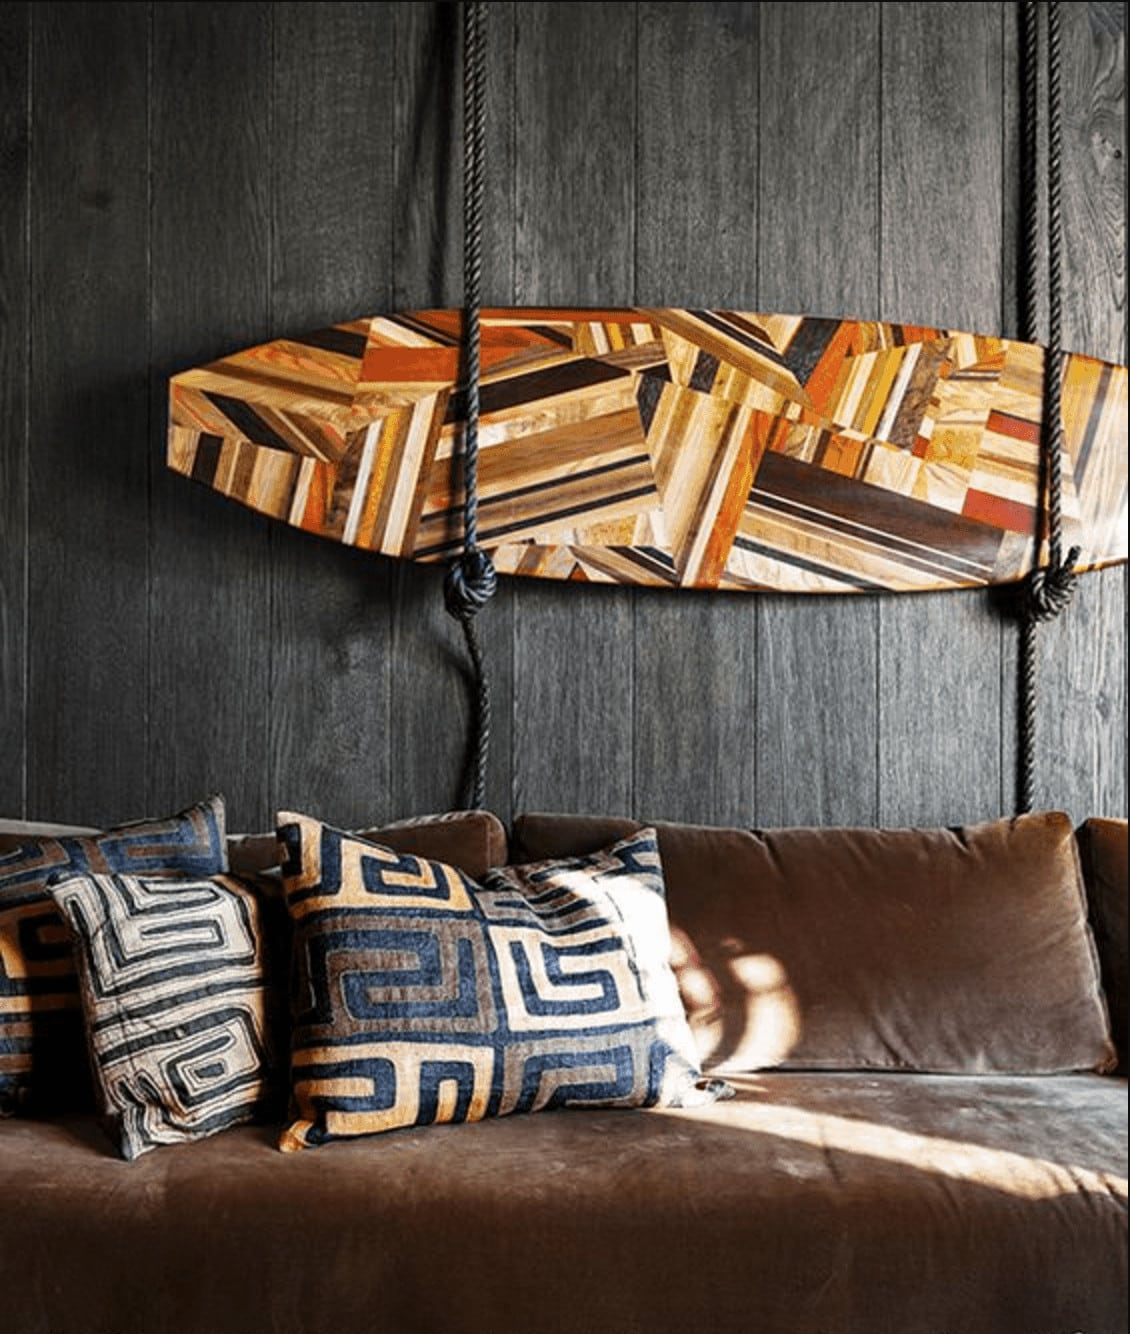 surfboard racks / hanging surfboard rack